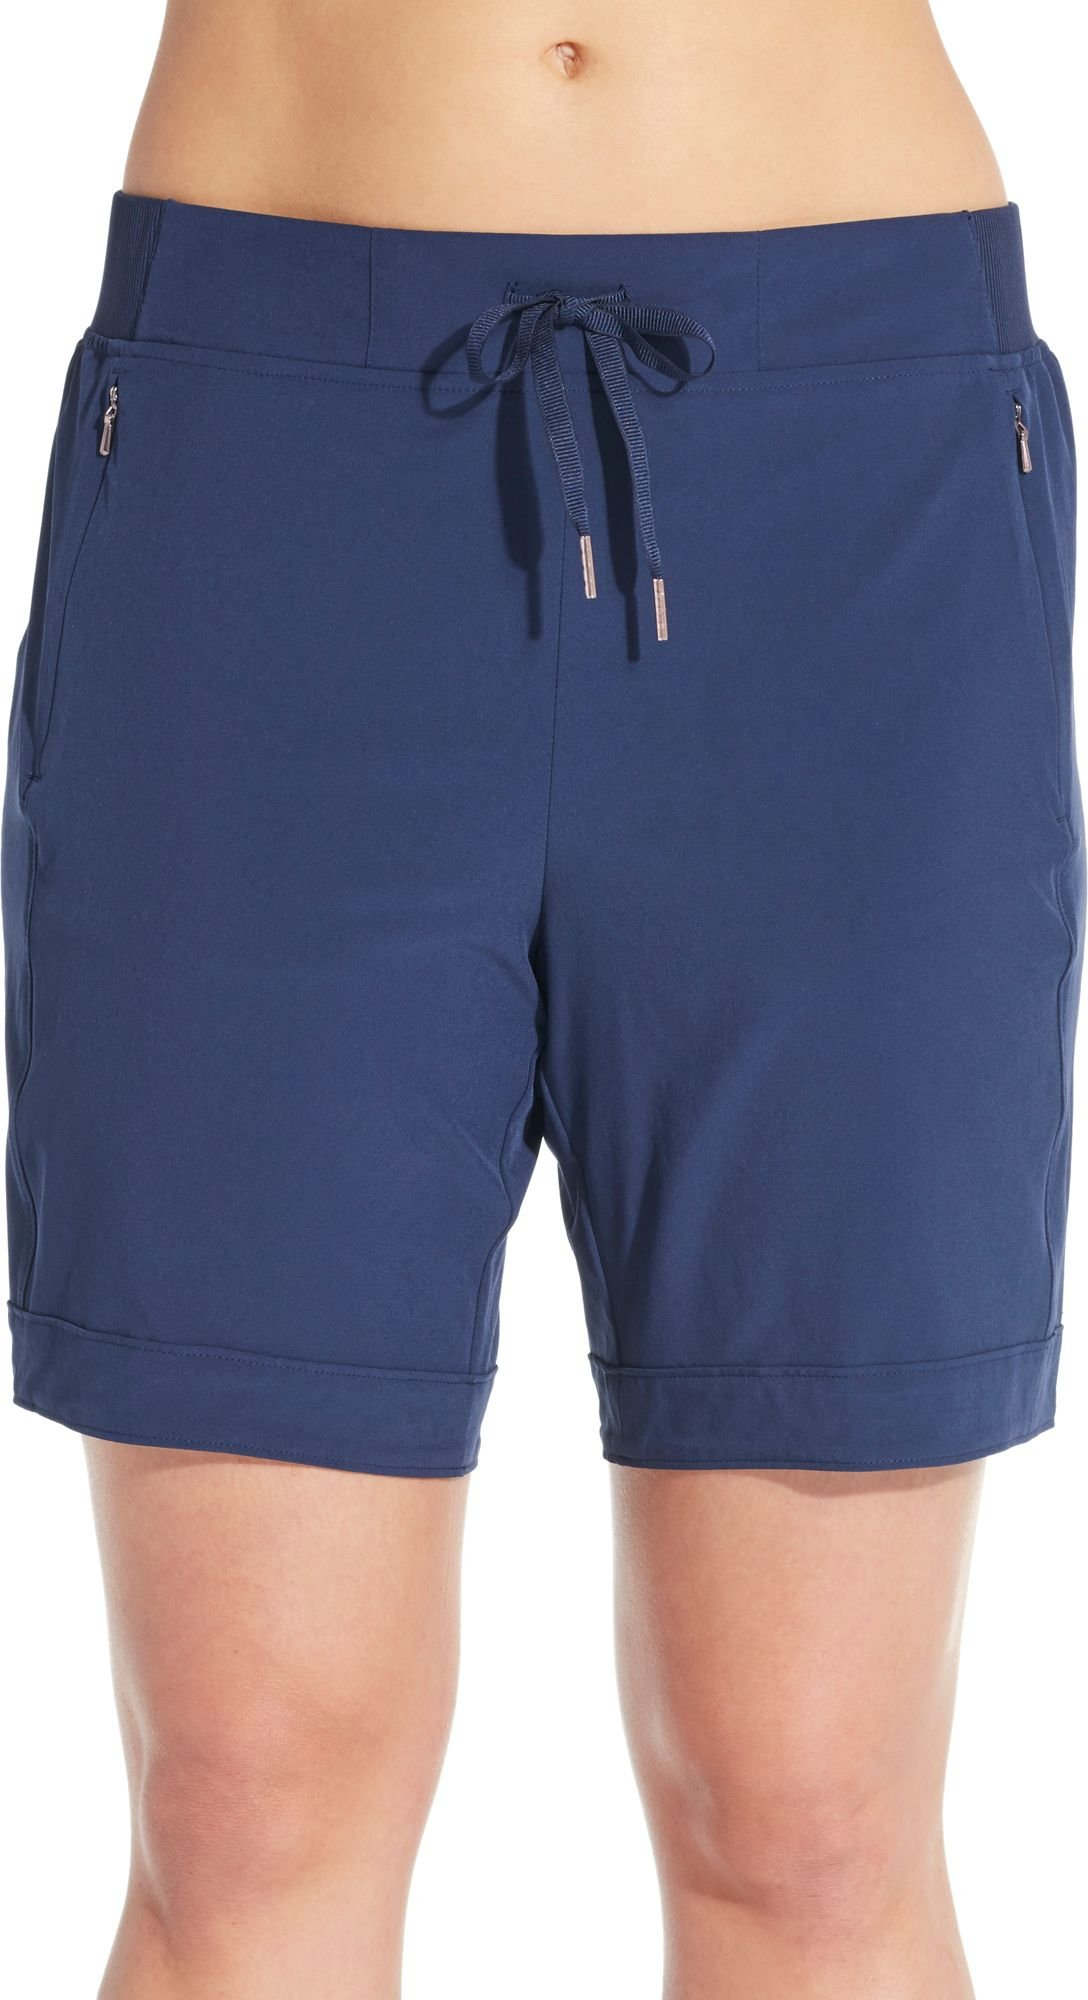 CALIA by Carrie Underwood Women's Anywhere Bermuda Shorts (S, Peacoat)